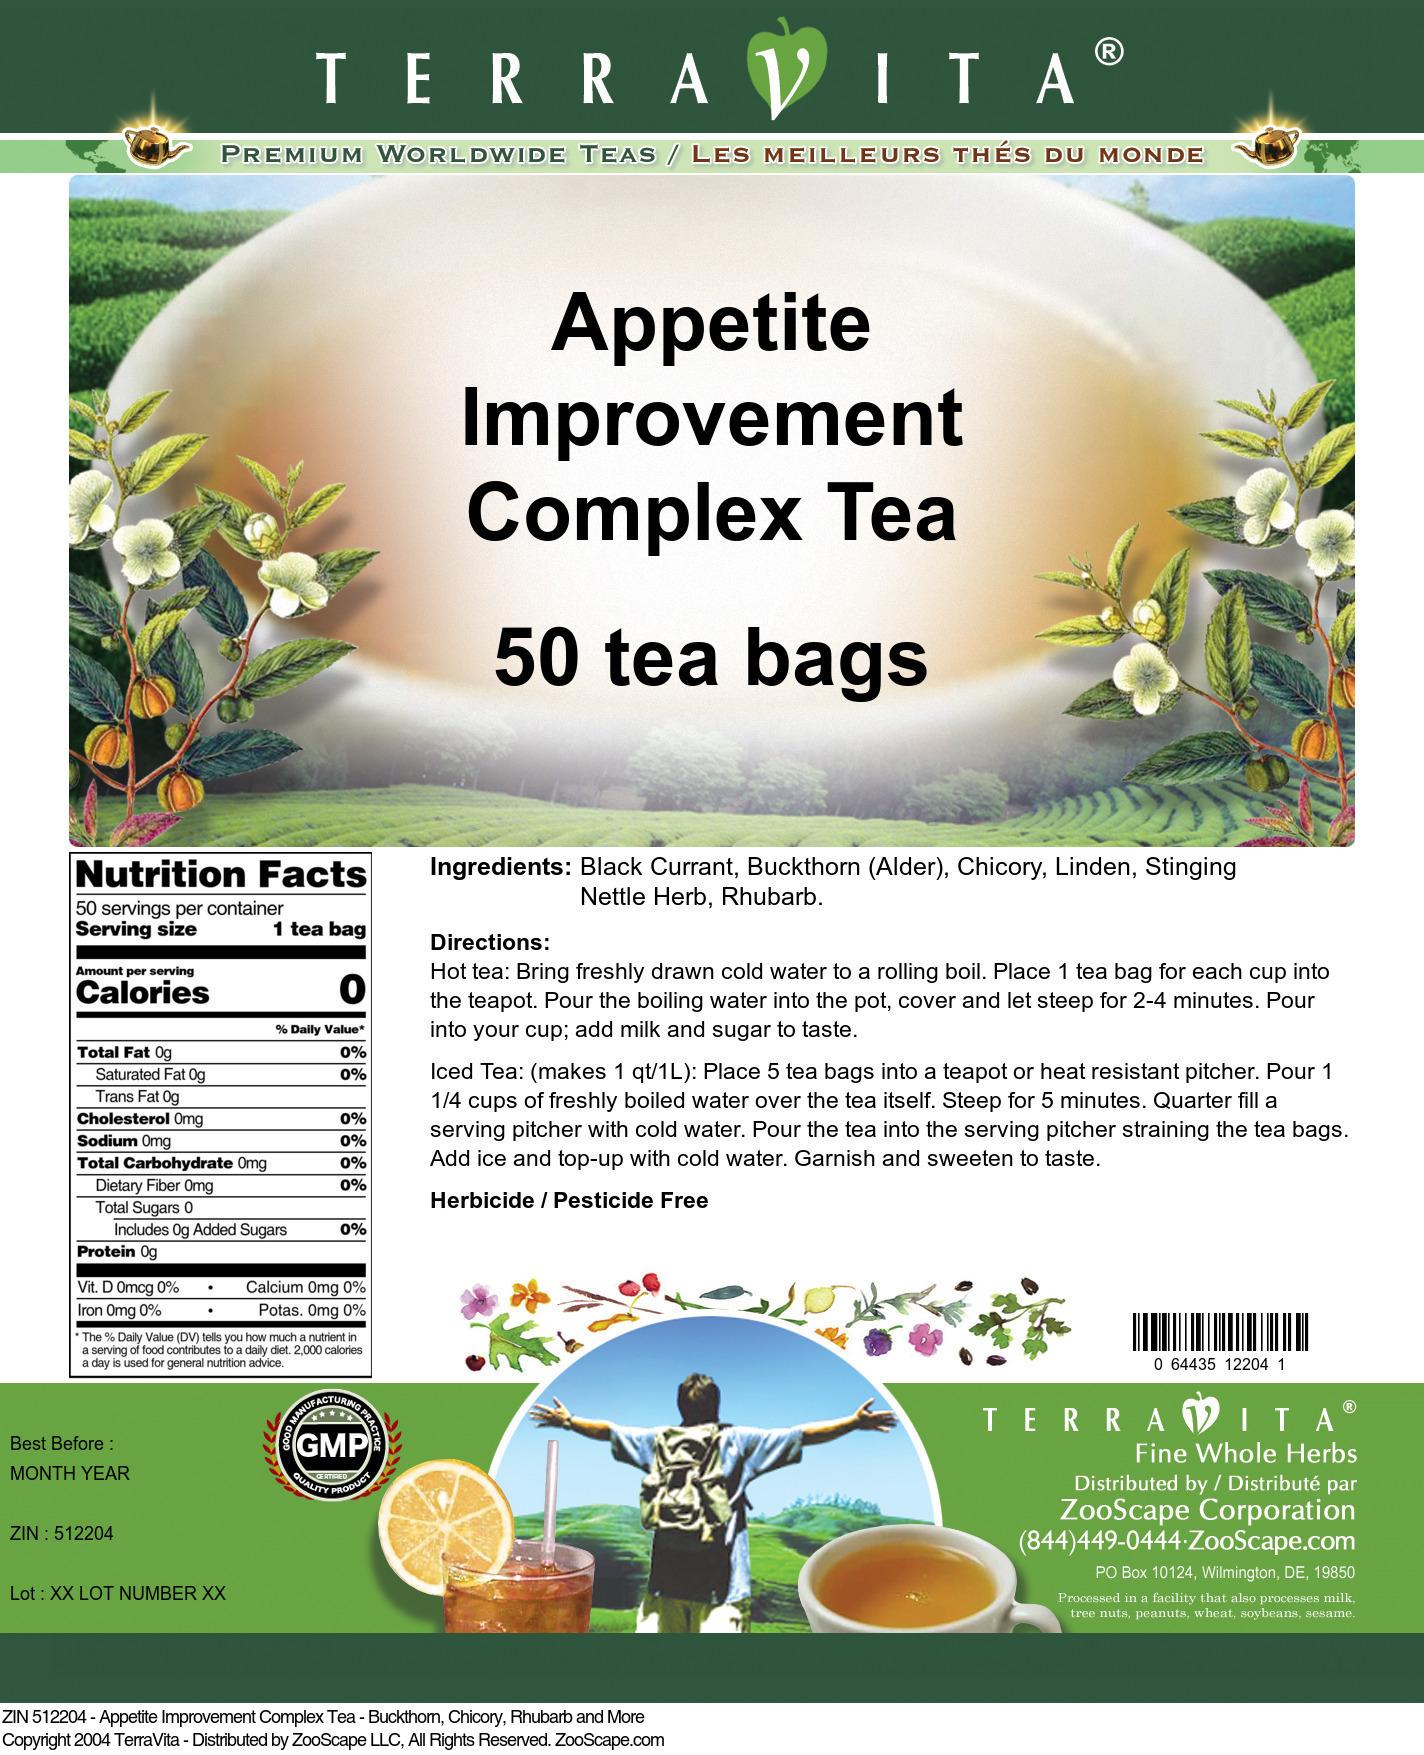 Appetite Improvement Complex